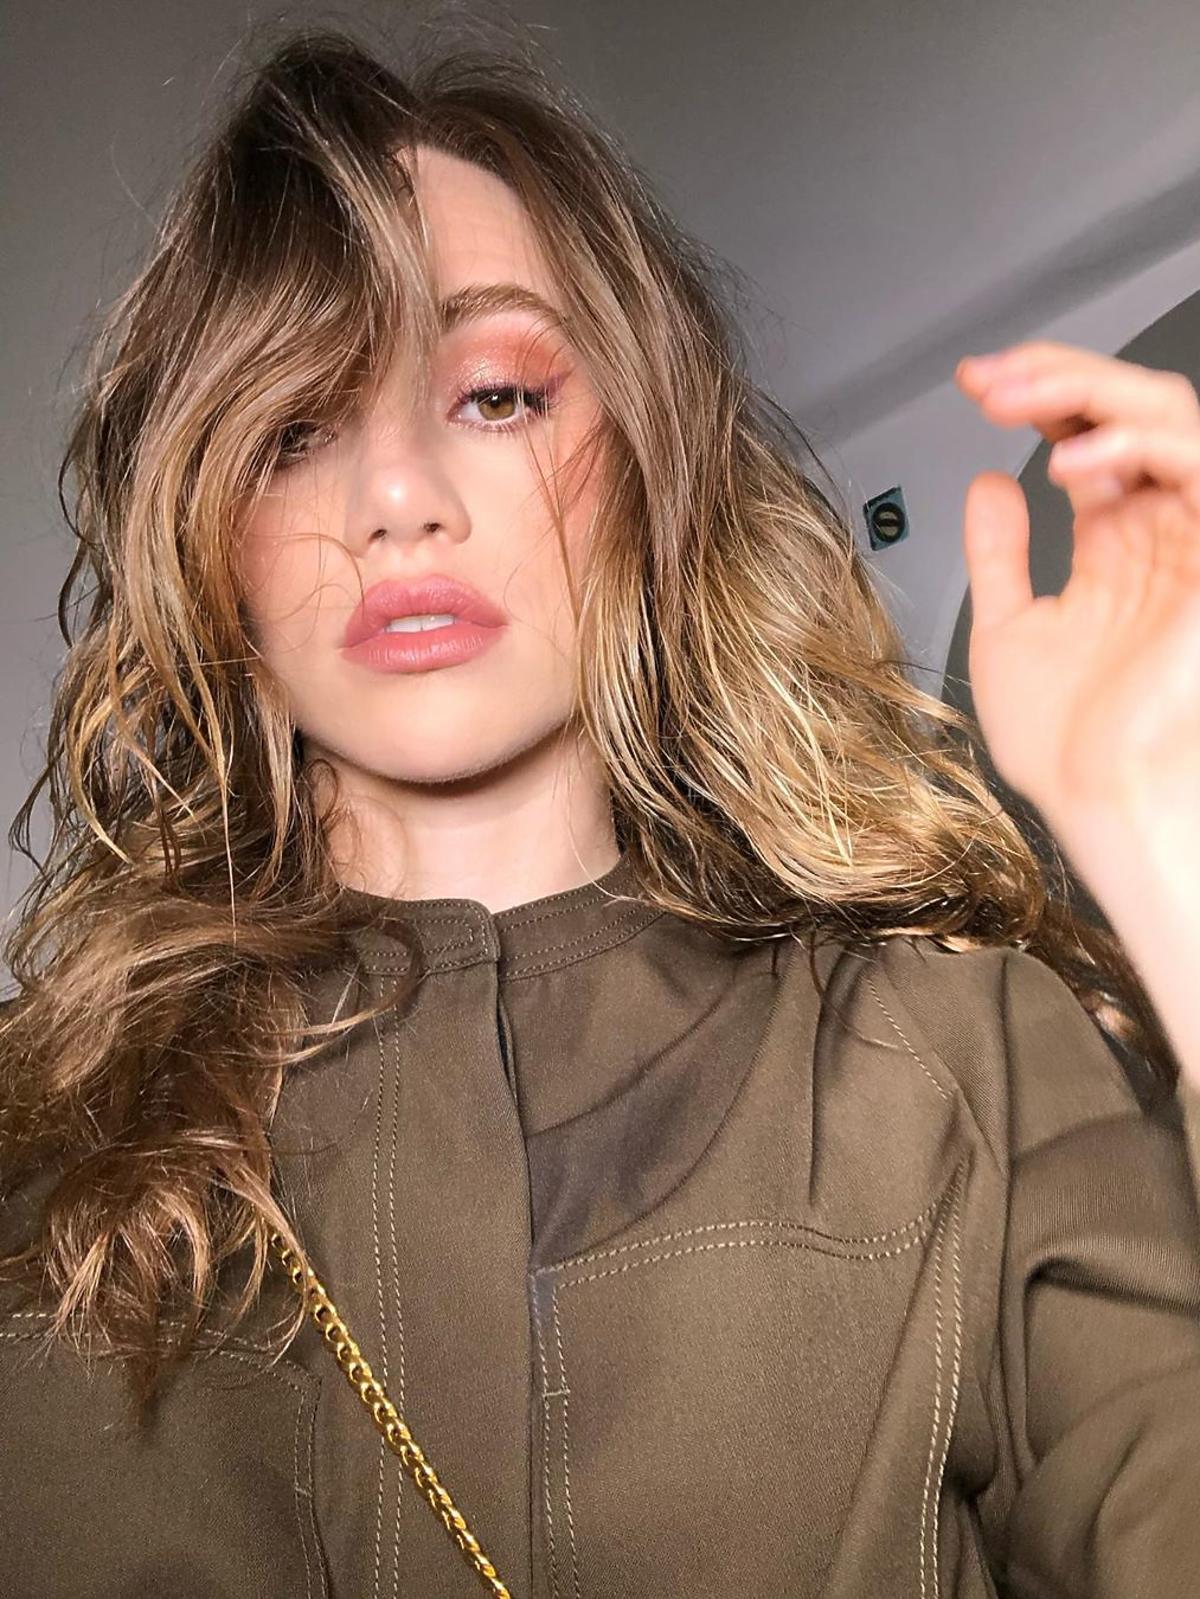 Modne fryzury: side swept bangs z falami